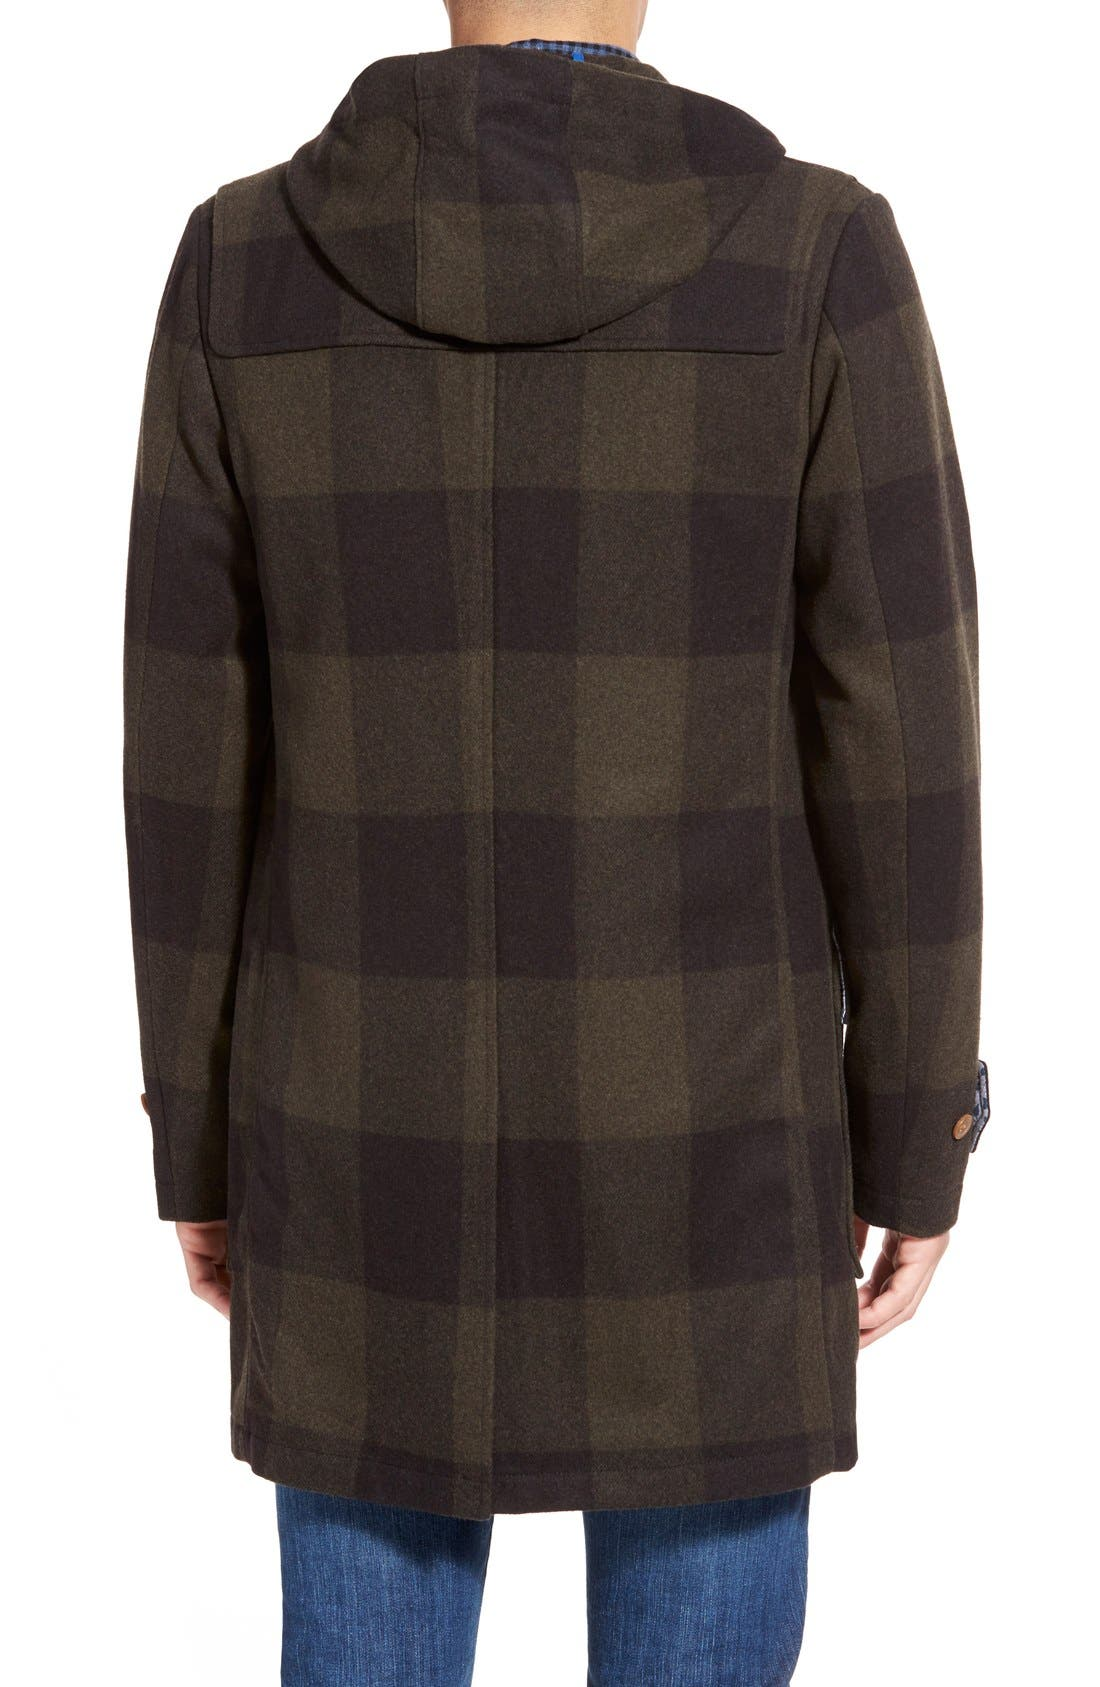 ORIGINAL PENGUIN,                             'Paddington' Wool Blend Duffle Coat,                             Alternate thumbnail 4, color,                             019